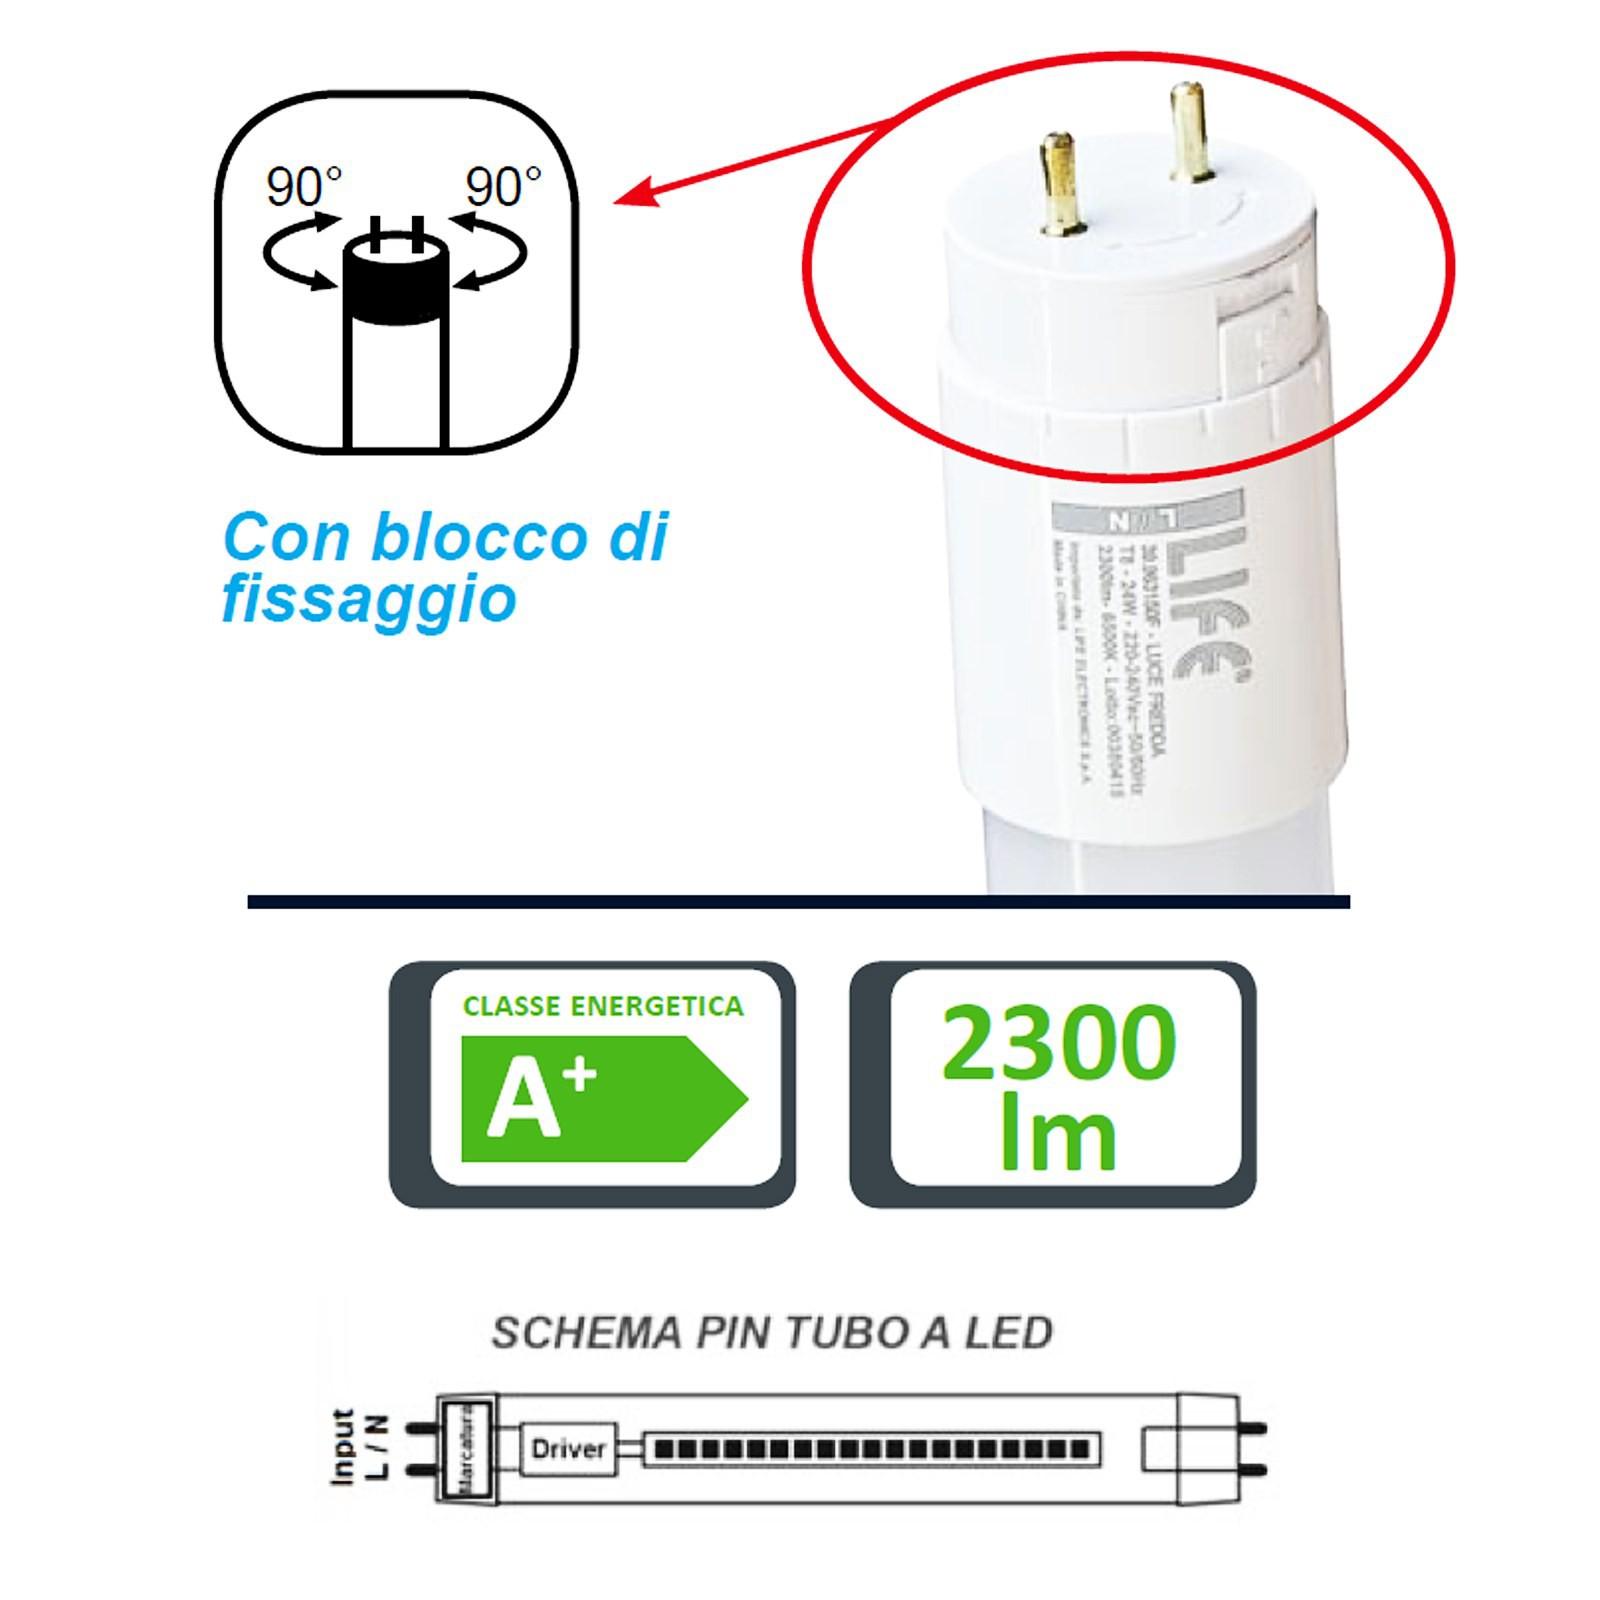 Schema Elettrico Lampada : Tubo neon led t8 150cm luce bianca fredda rotativo life lampada 24